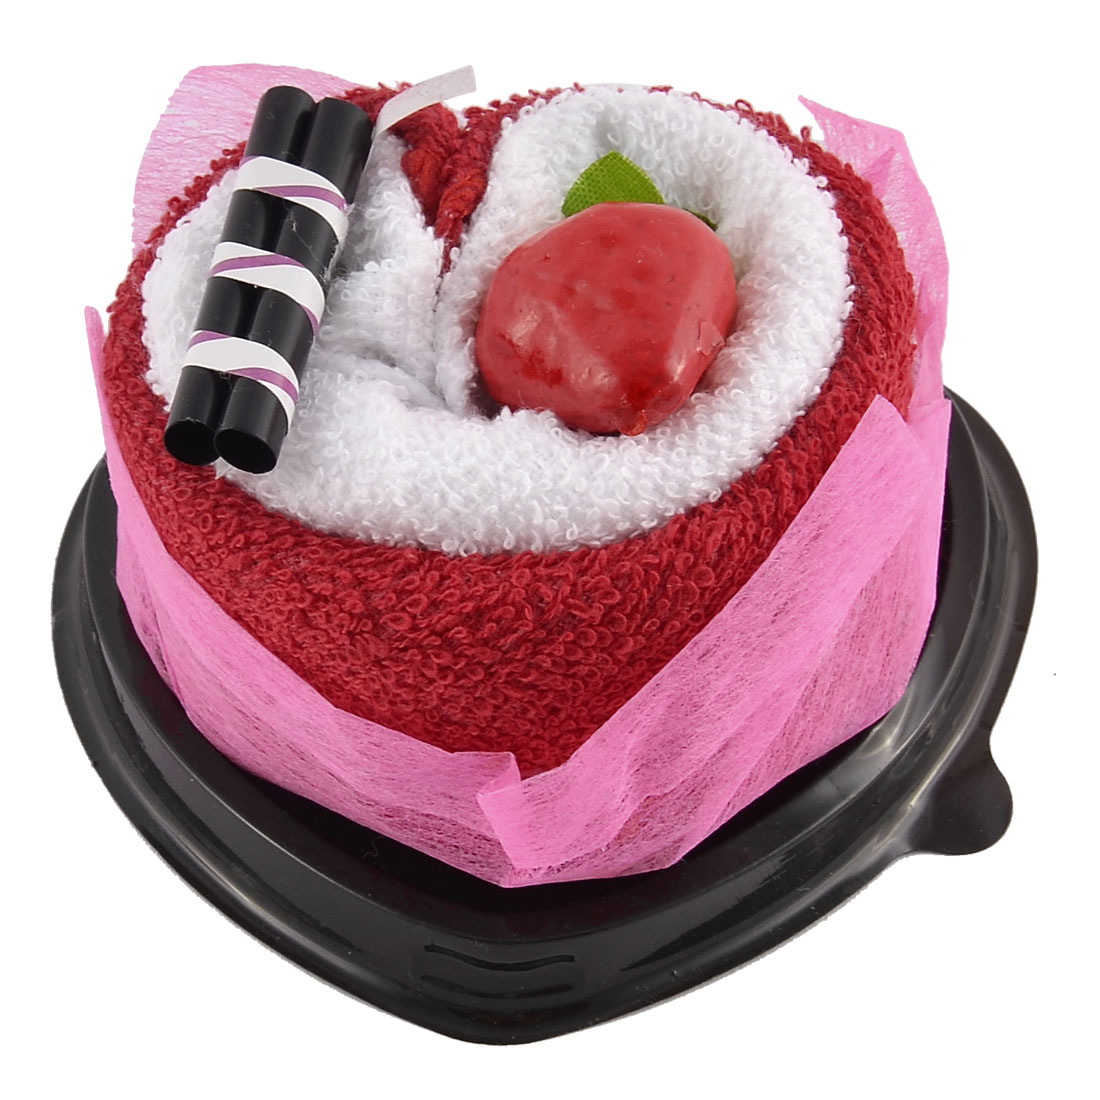 Simulated Strawberry Chocolate Bar Detail Heart Shape Cupcake Towel Washcloth Decor Gift Red